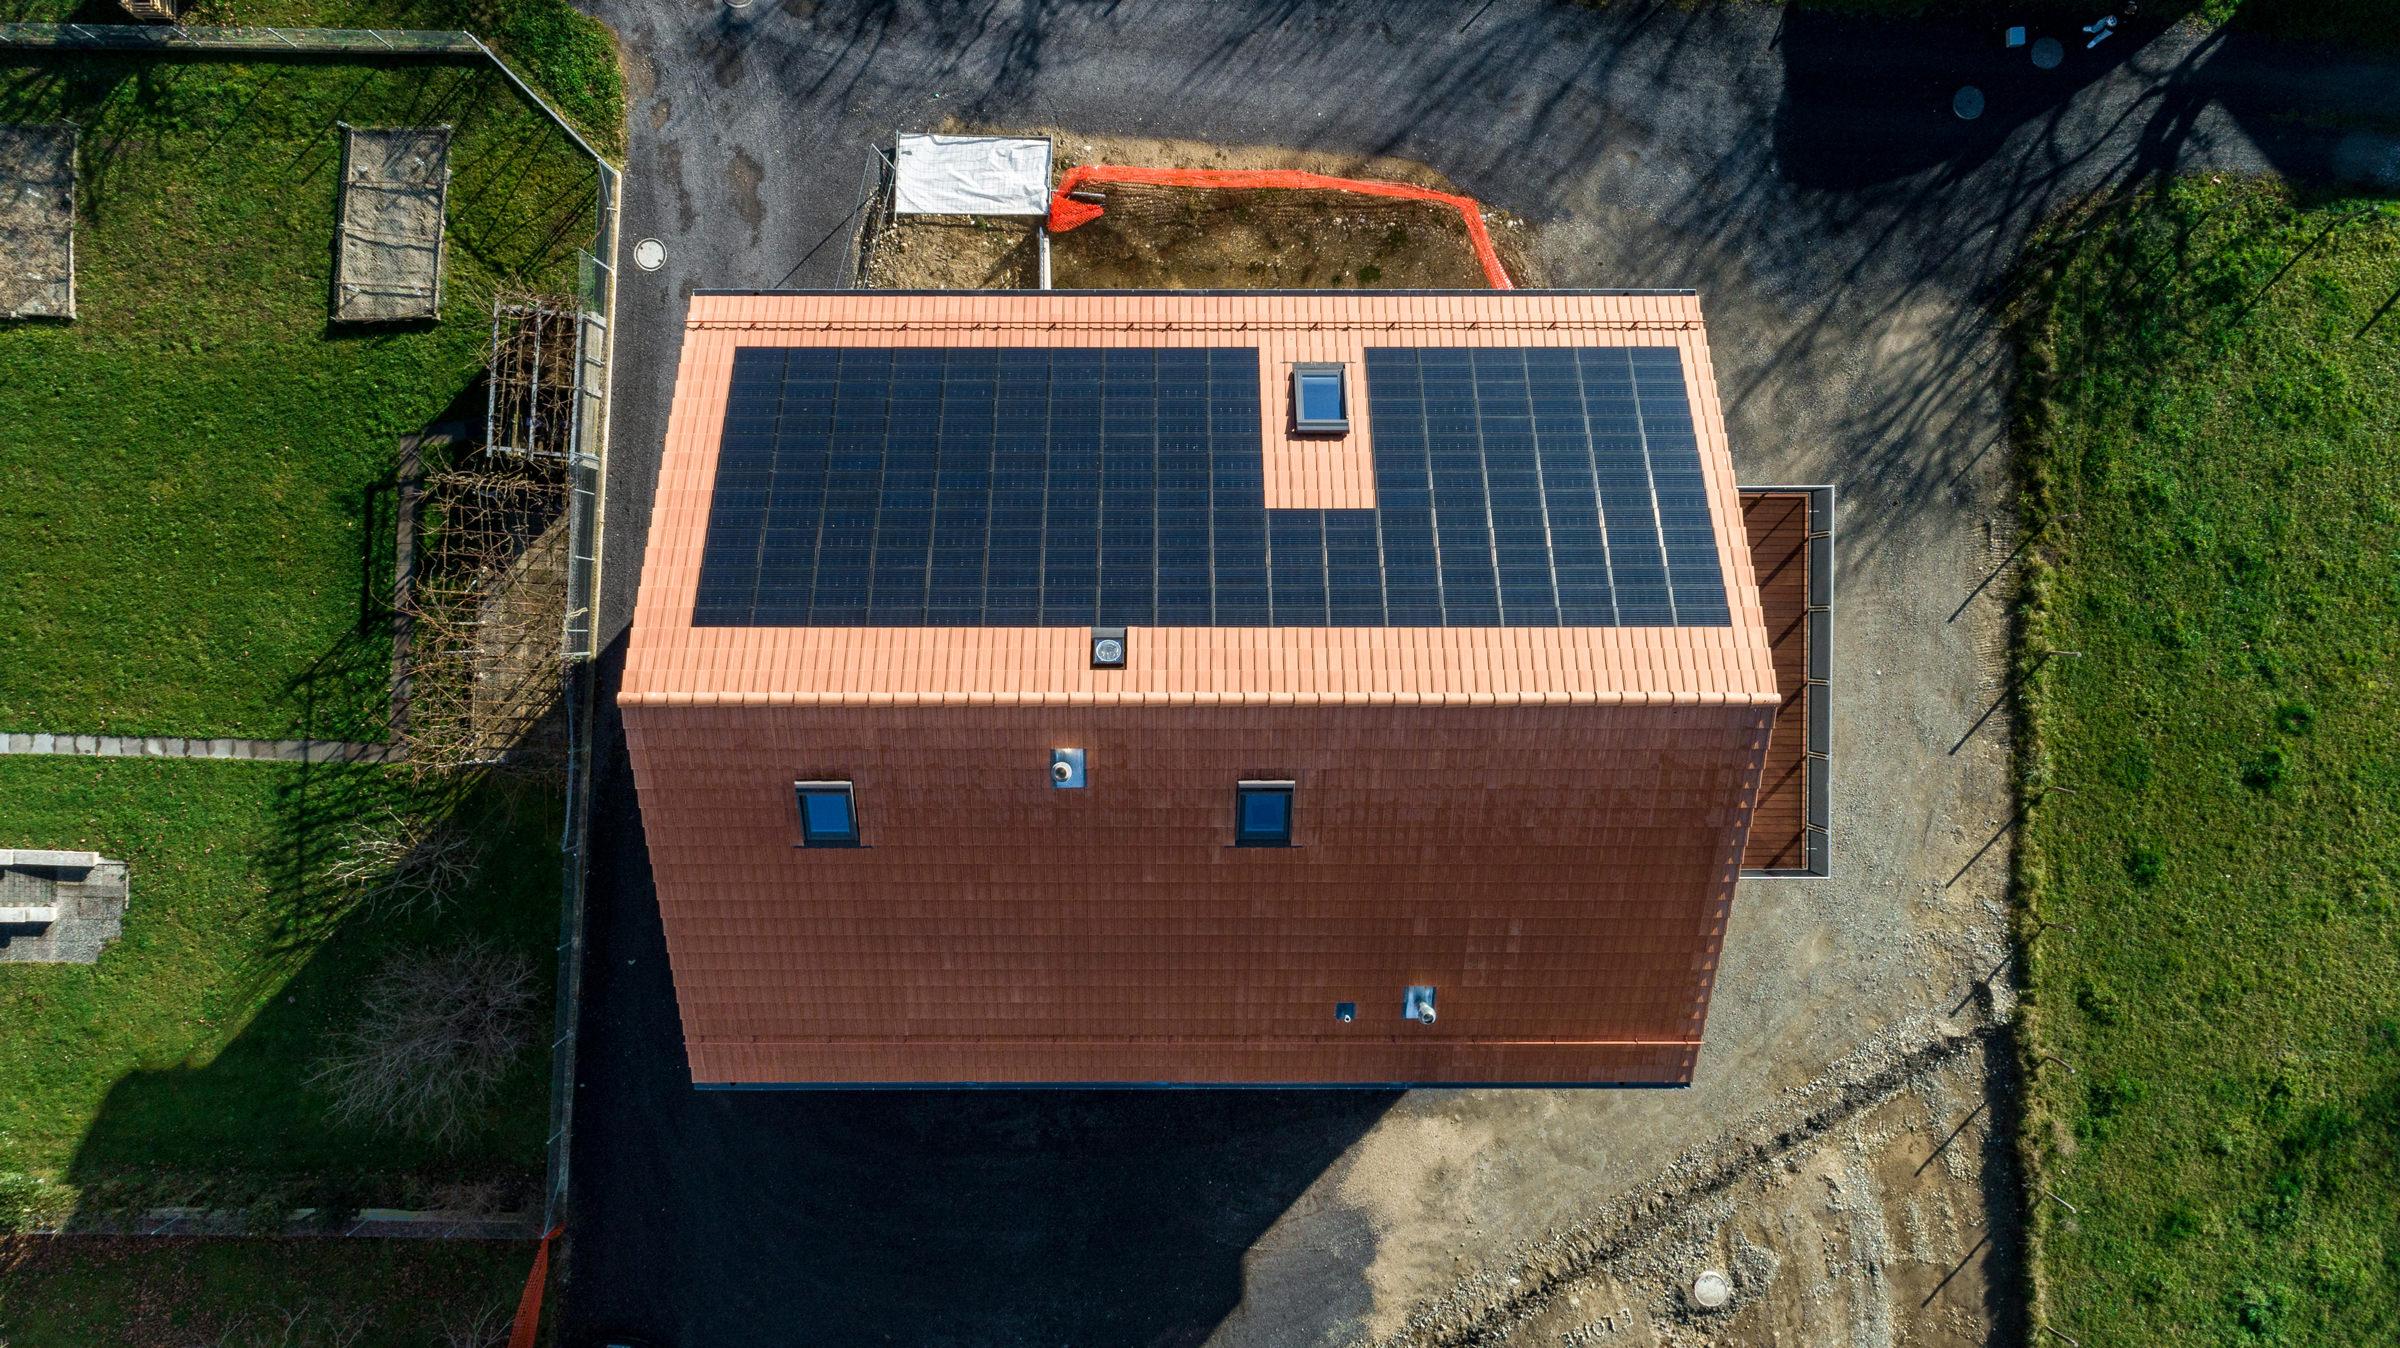 Sanierung Mehrfamilienhaus, Granges-Marnand, Waadt, Solarmodul FIT 52, Flachschiebeziegel FS 03 (ZR), Gasser Ceramic, Panotron AG